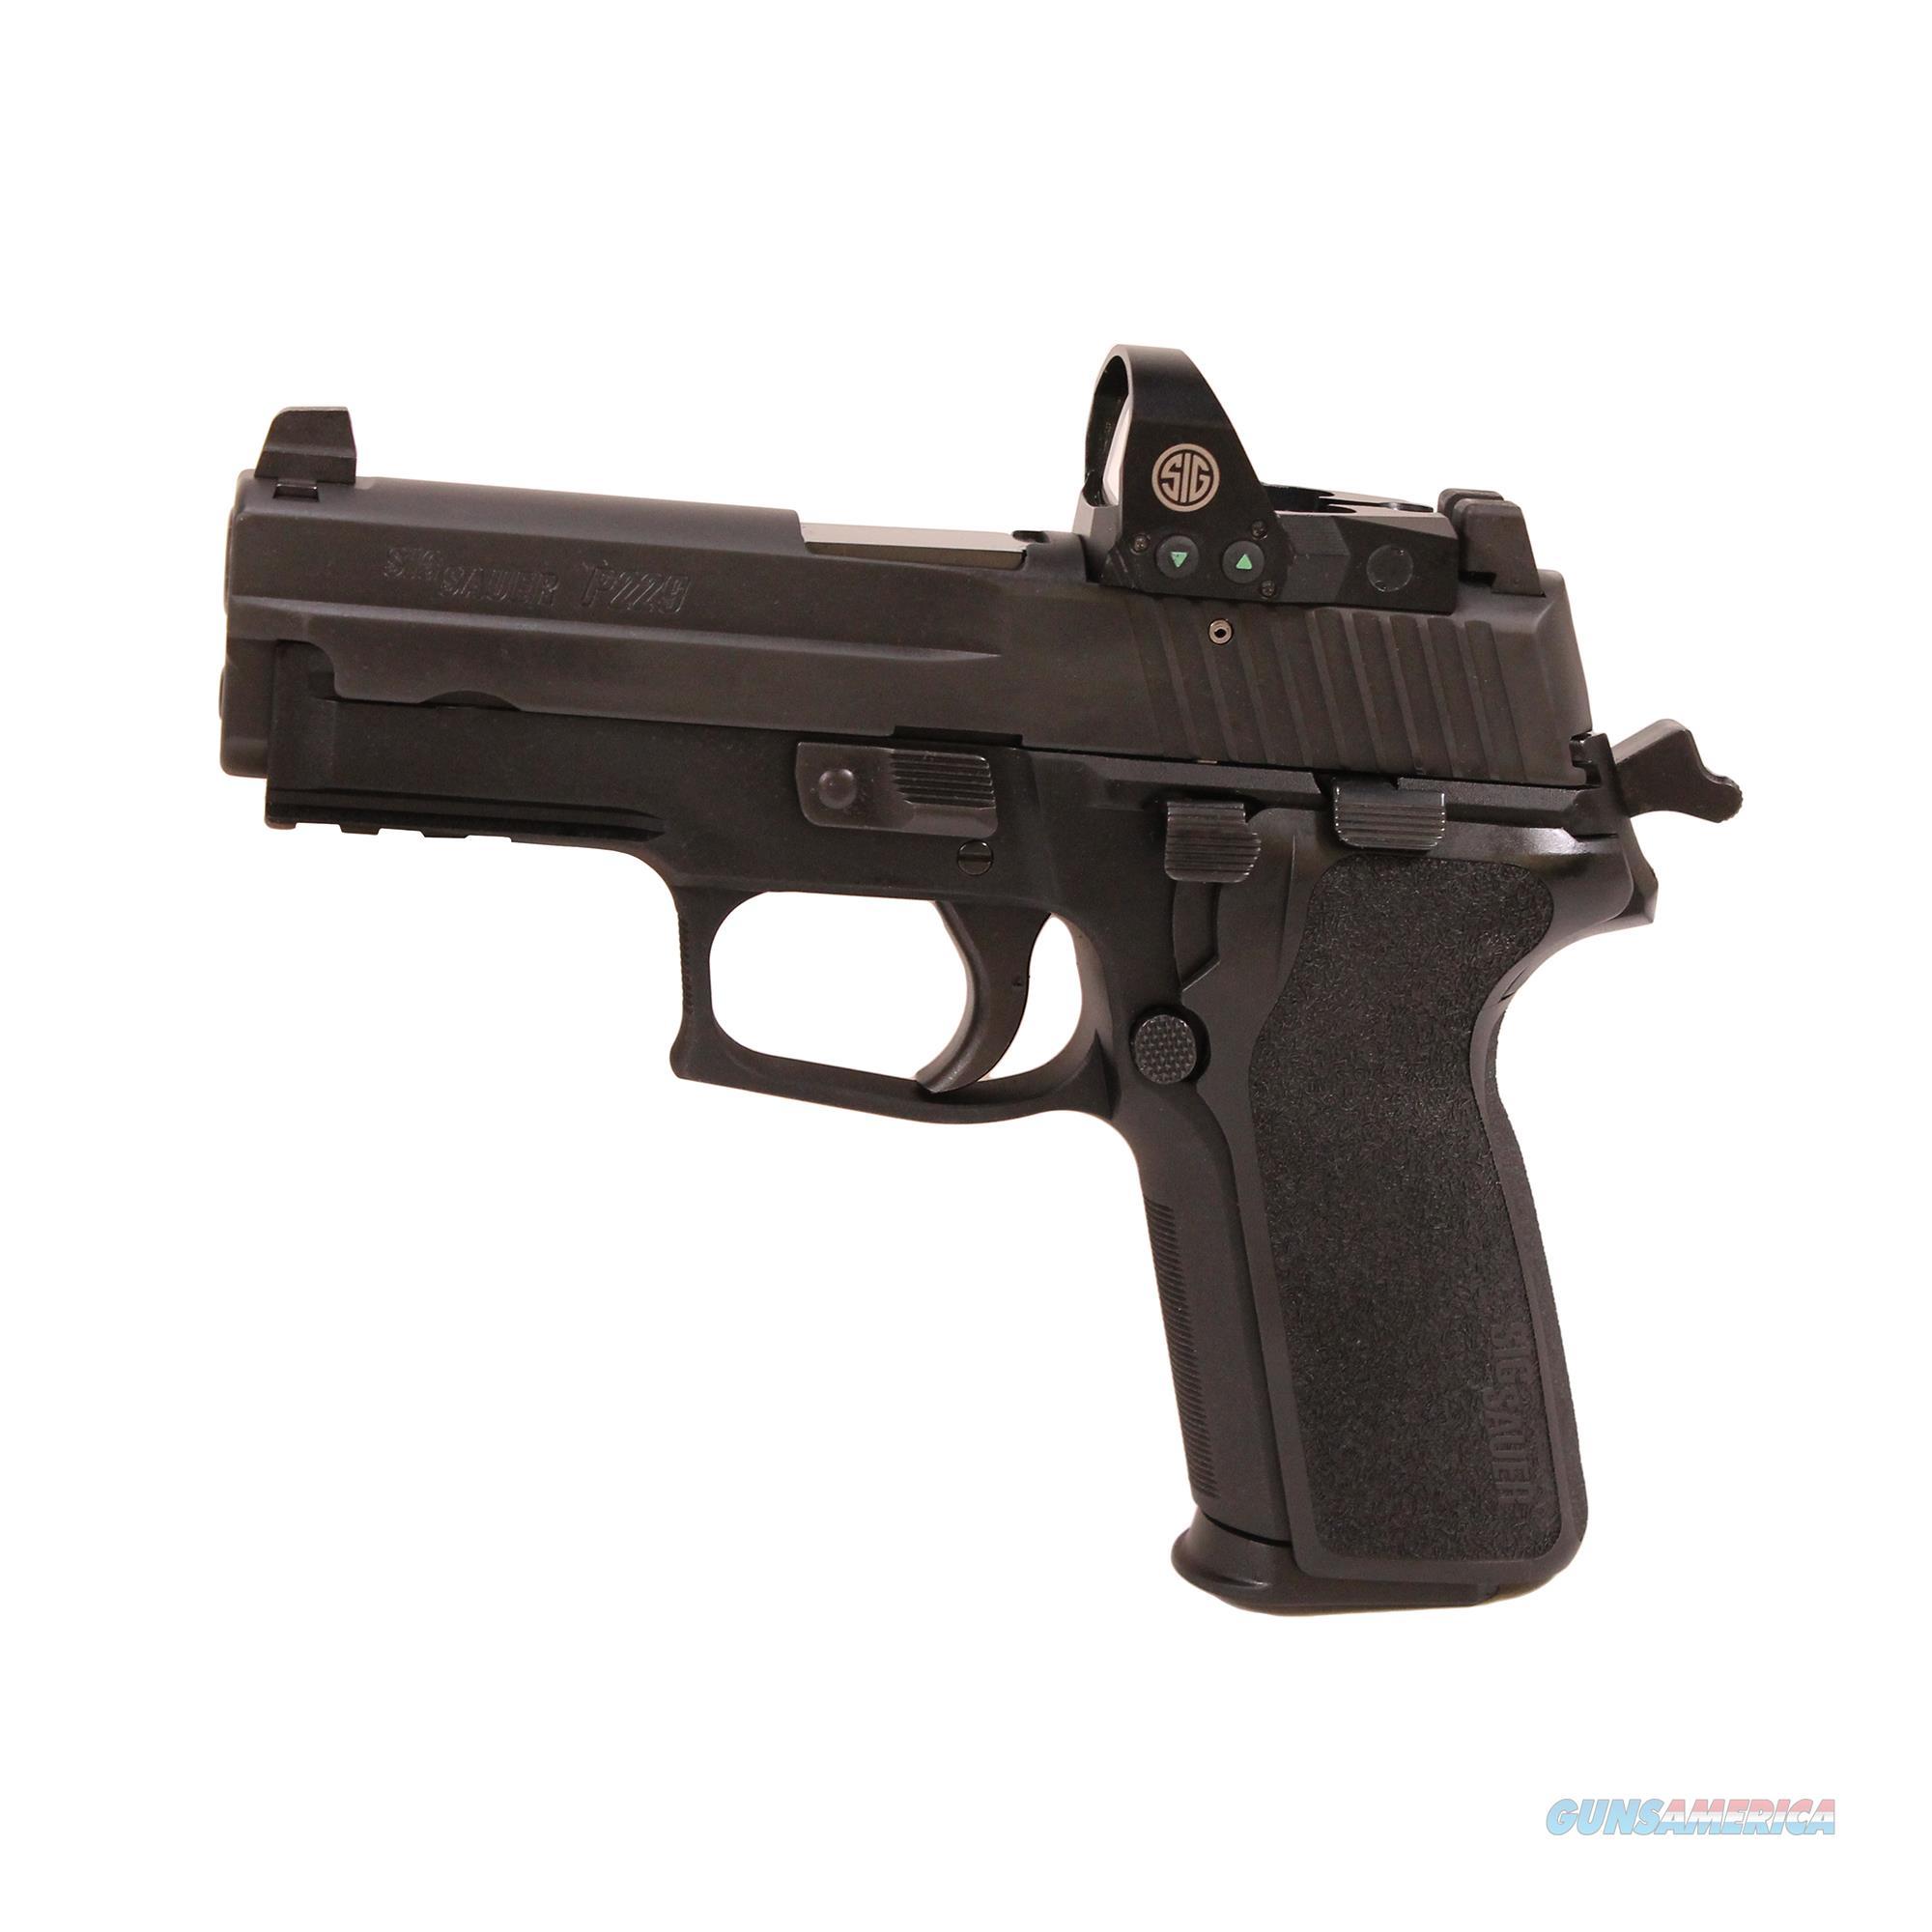 Sig Sauer P229 229R-9-BSS-RX  Guns > Pistols > S Misc Pistols